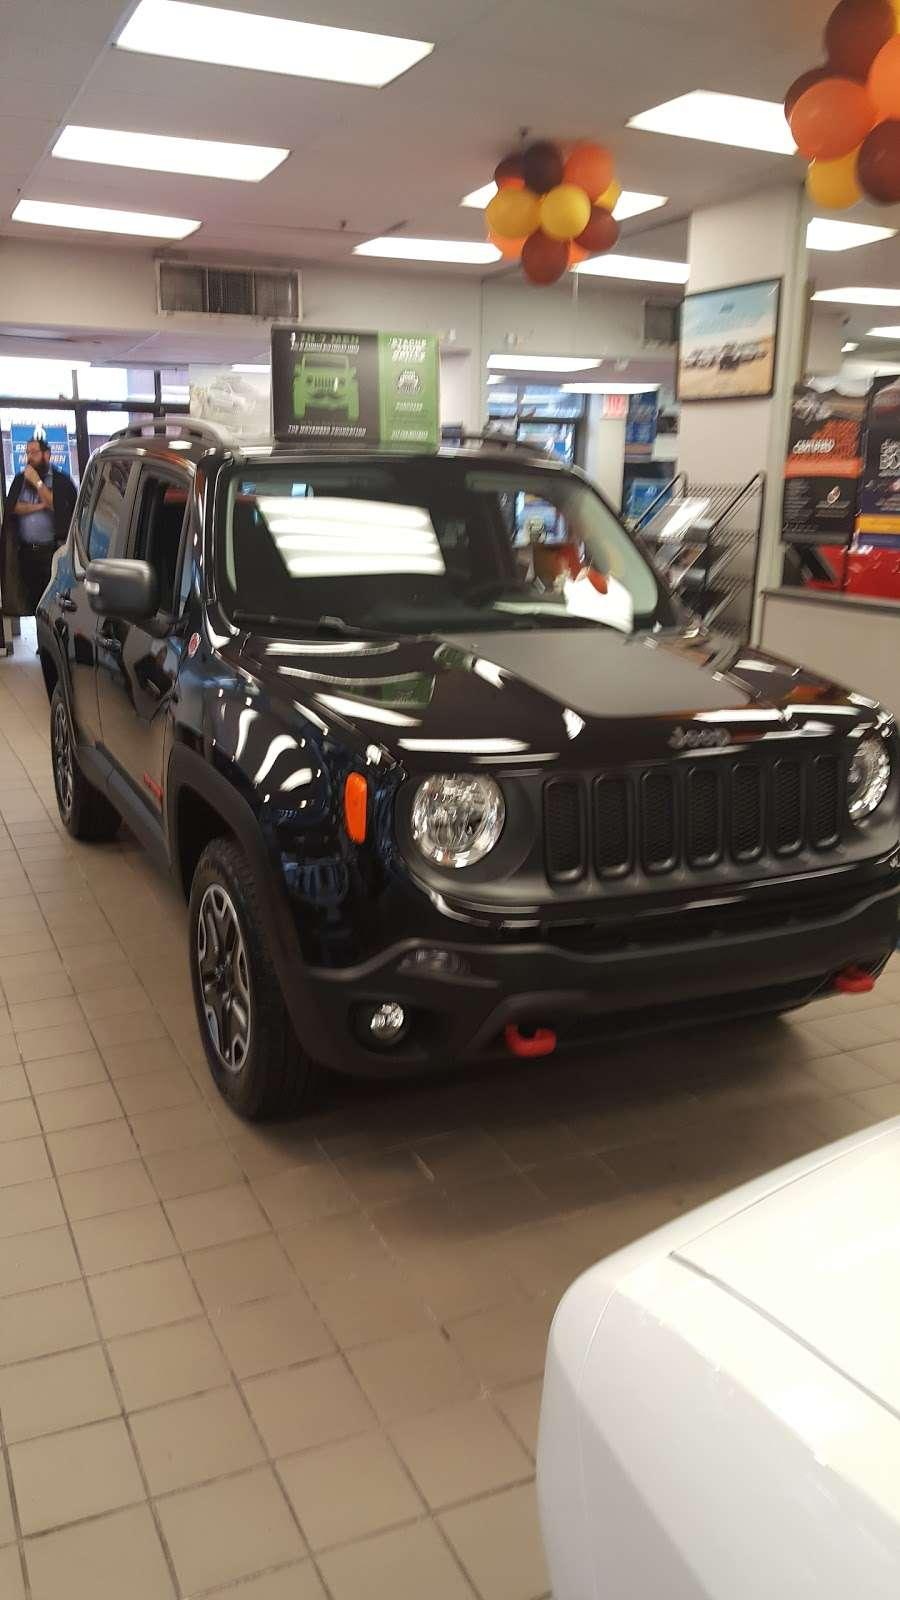 Riverdale Chrysler Jeep Dodge Ram - car dealer  | Photo 10 of 10 | Address: 5869 Broadway, Bronx, NY 10463, USA | Phone: (718) 548-2800